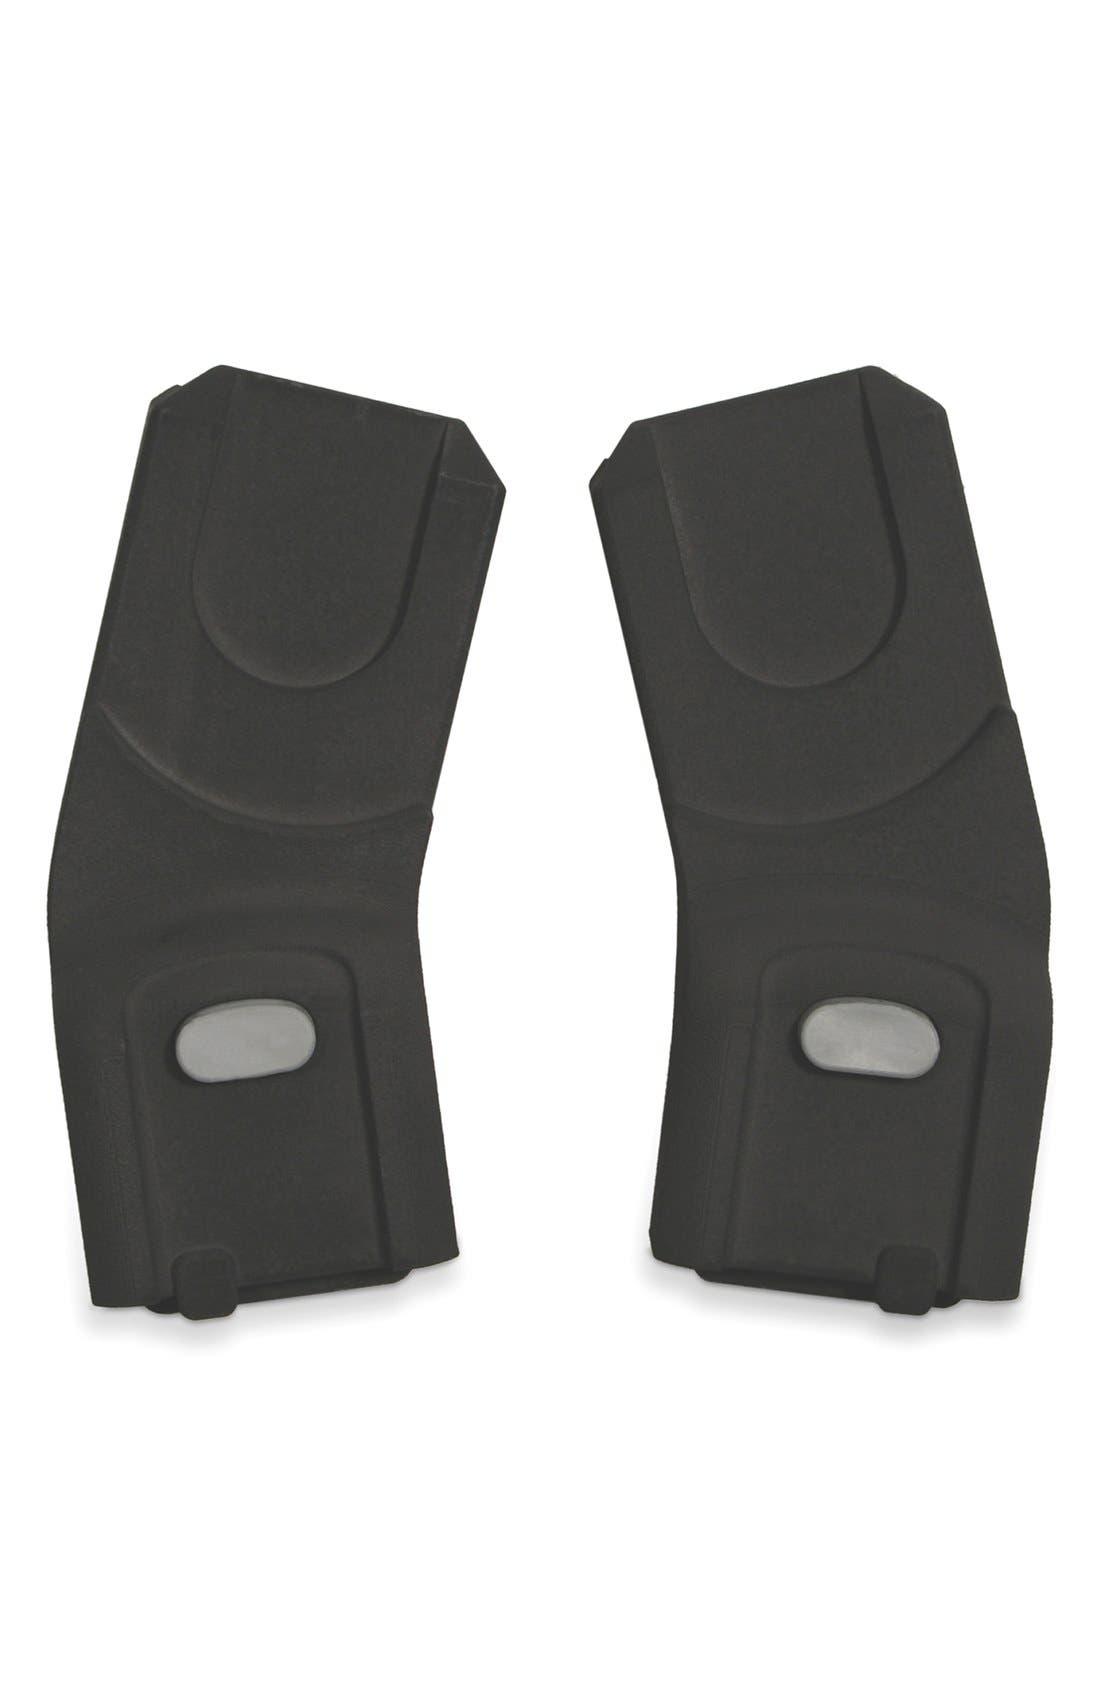 Alternate Image 1 Selected - UPPAbaby VISTA & CRUZ  Maxi-Cosi® Infant Car Seat Adapter